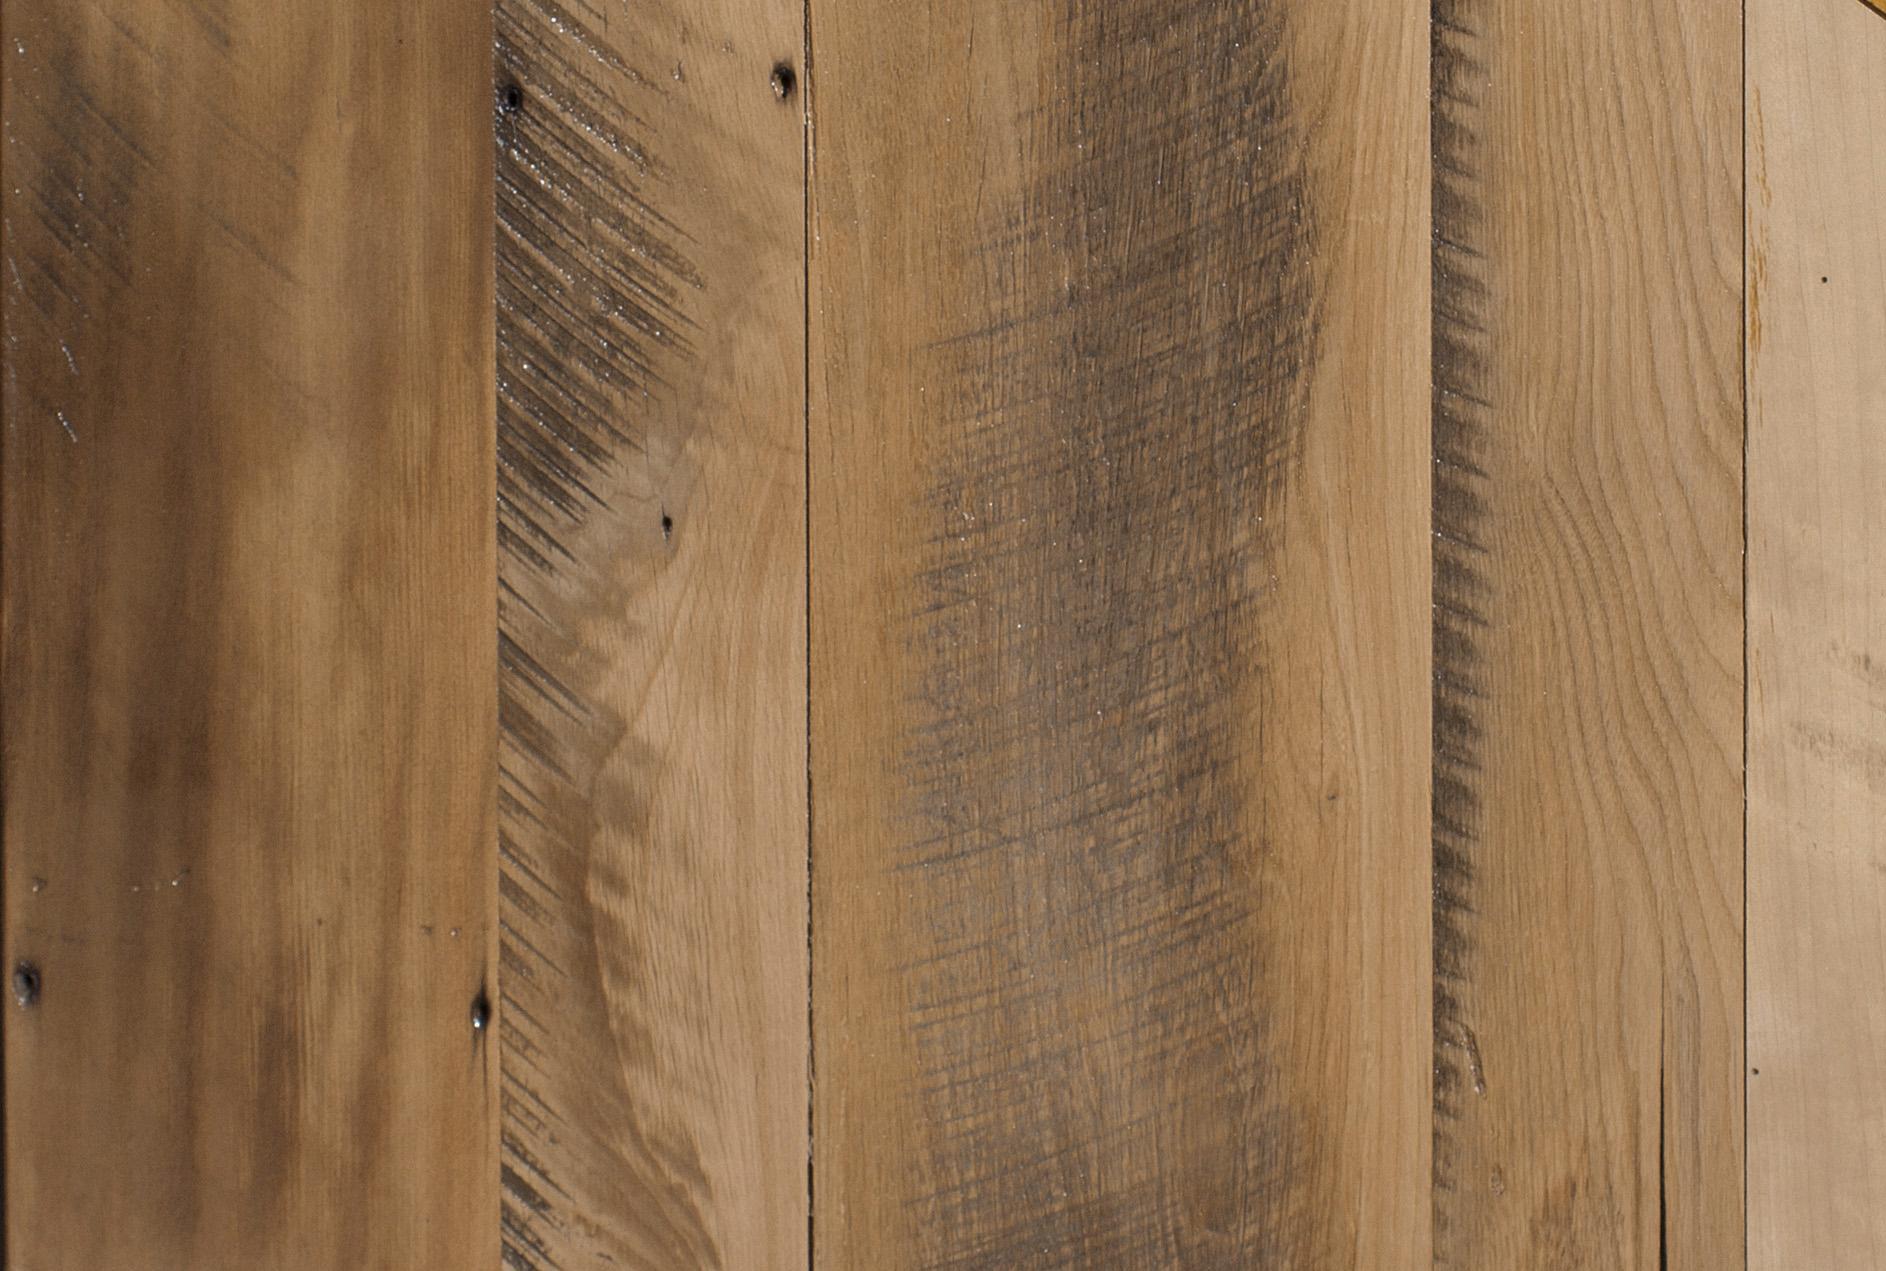 Longleaf Lumber Skip Planed Midwestern Mixed Hardwoods